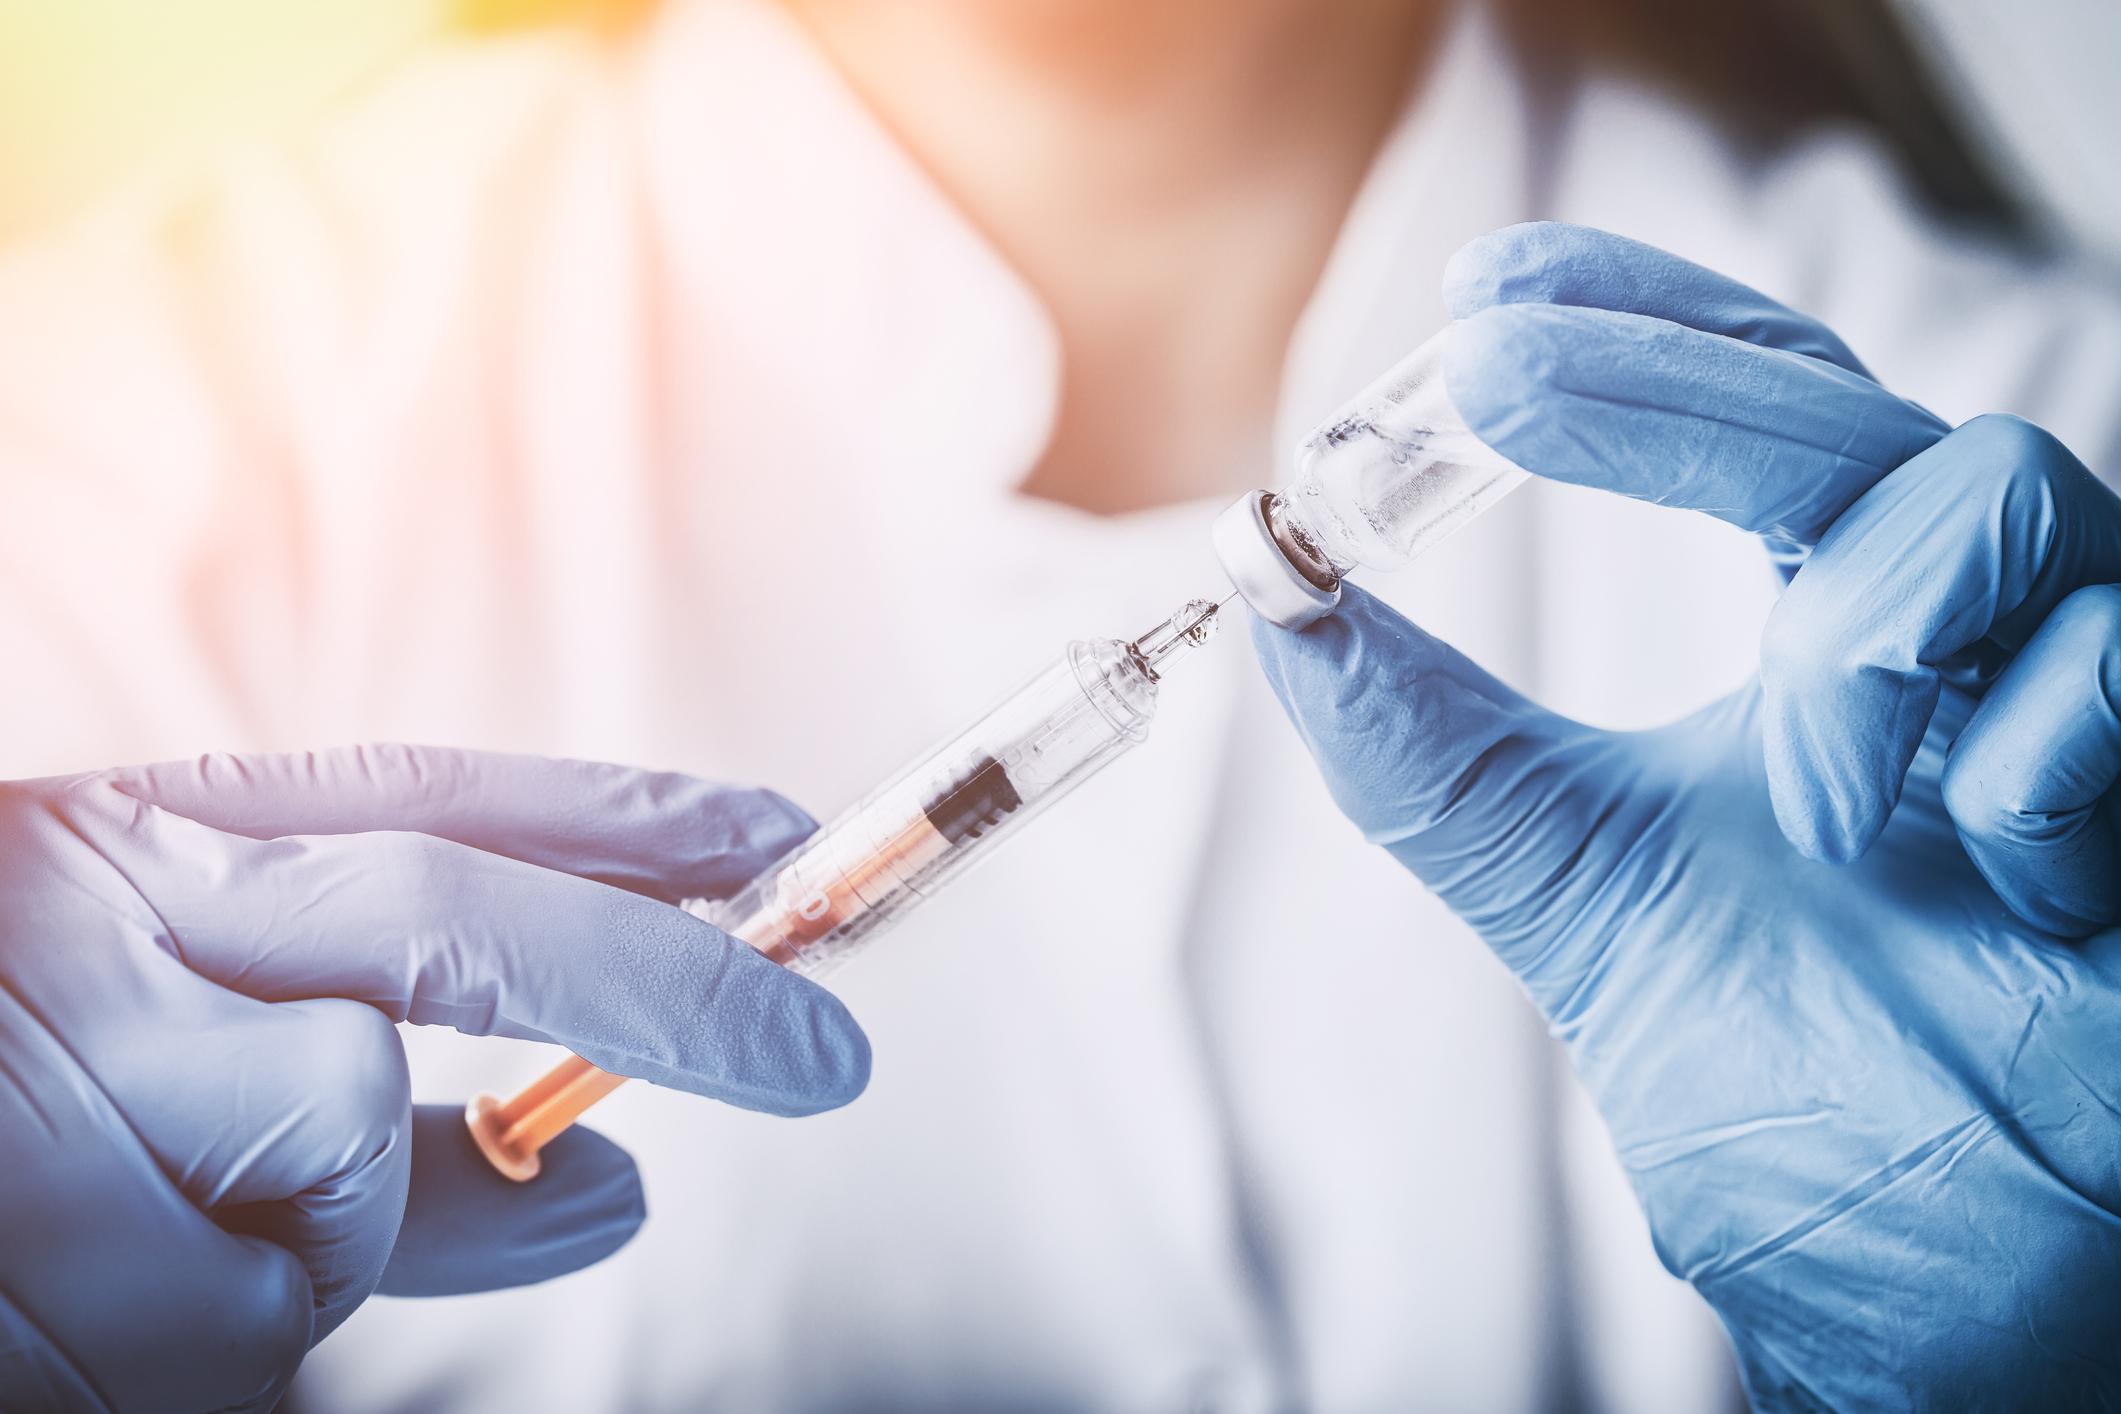 Female healthcare professional holding syringe and vaccine bottle